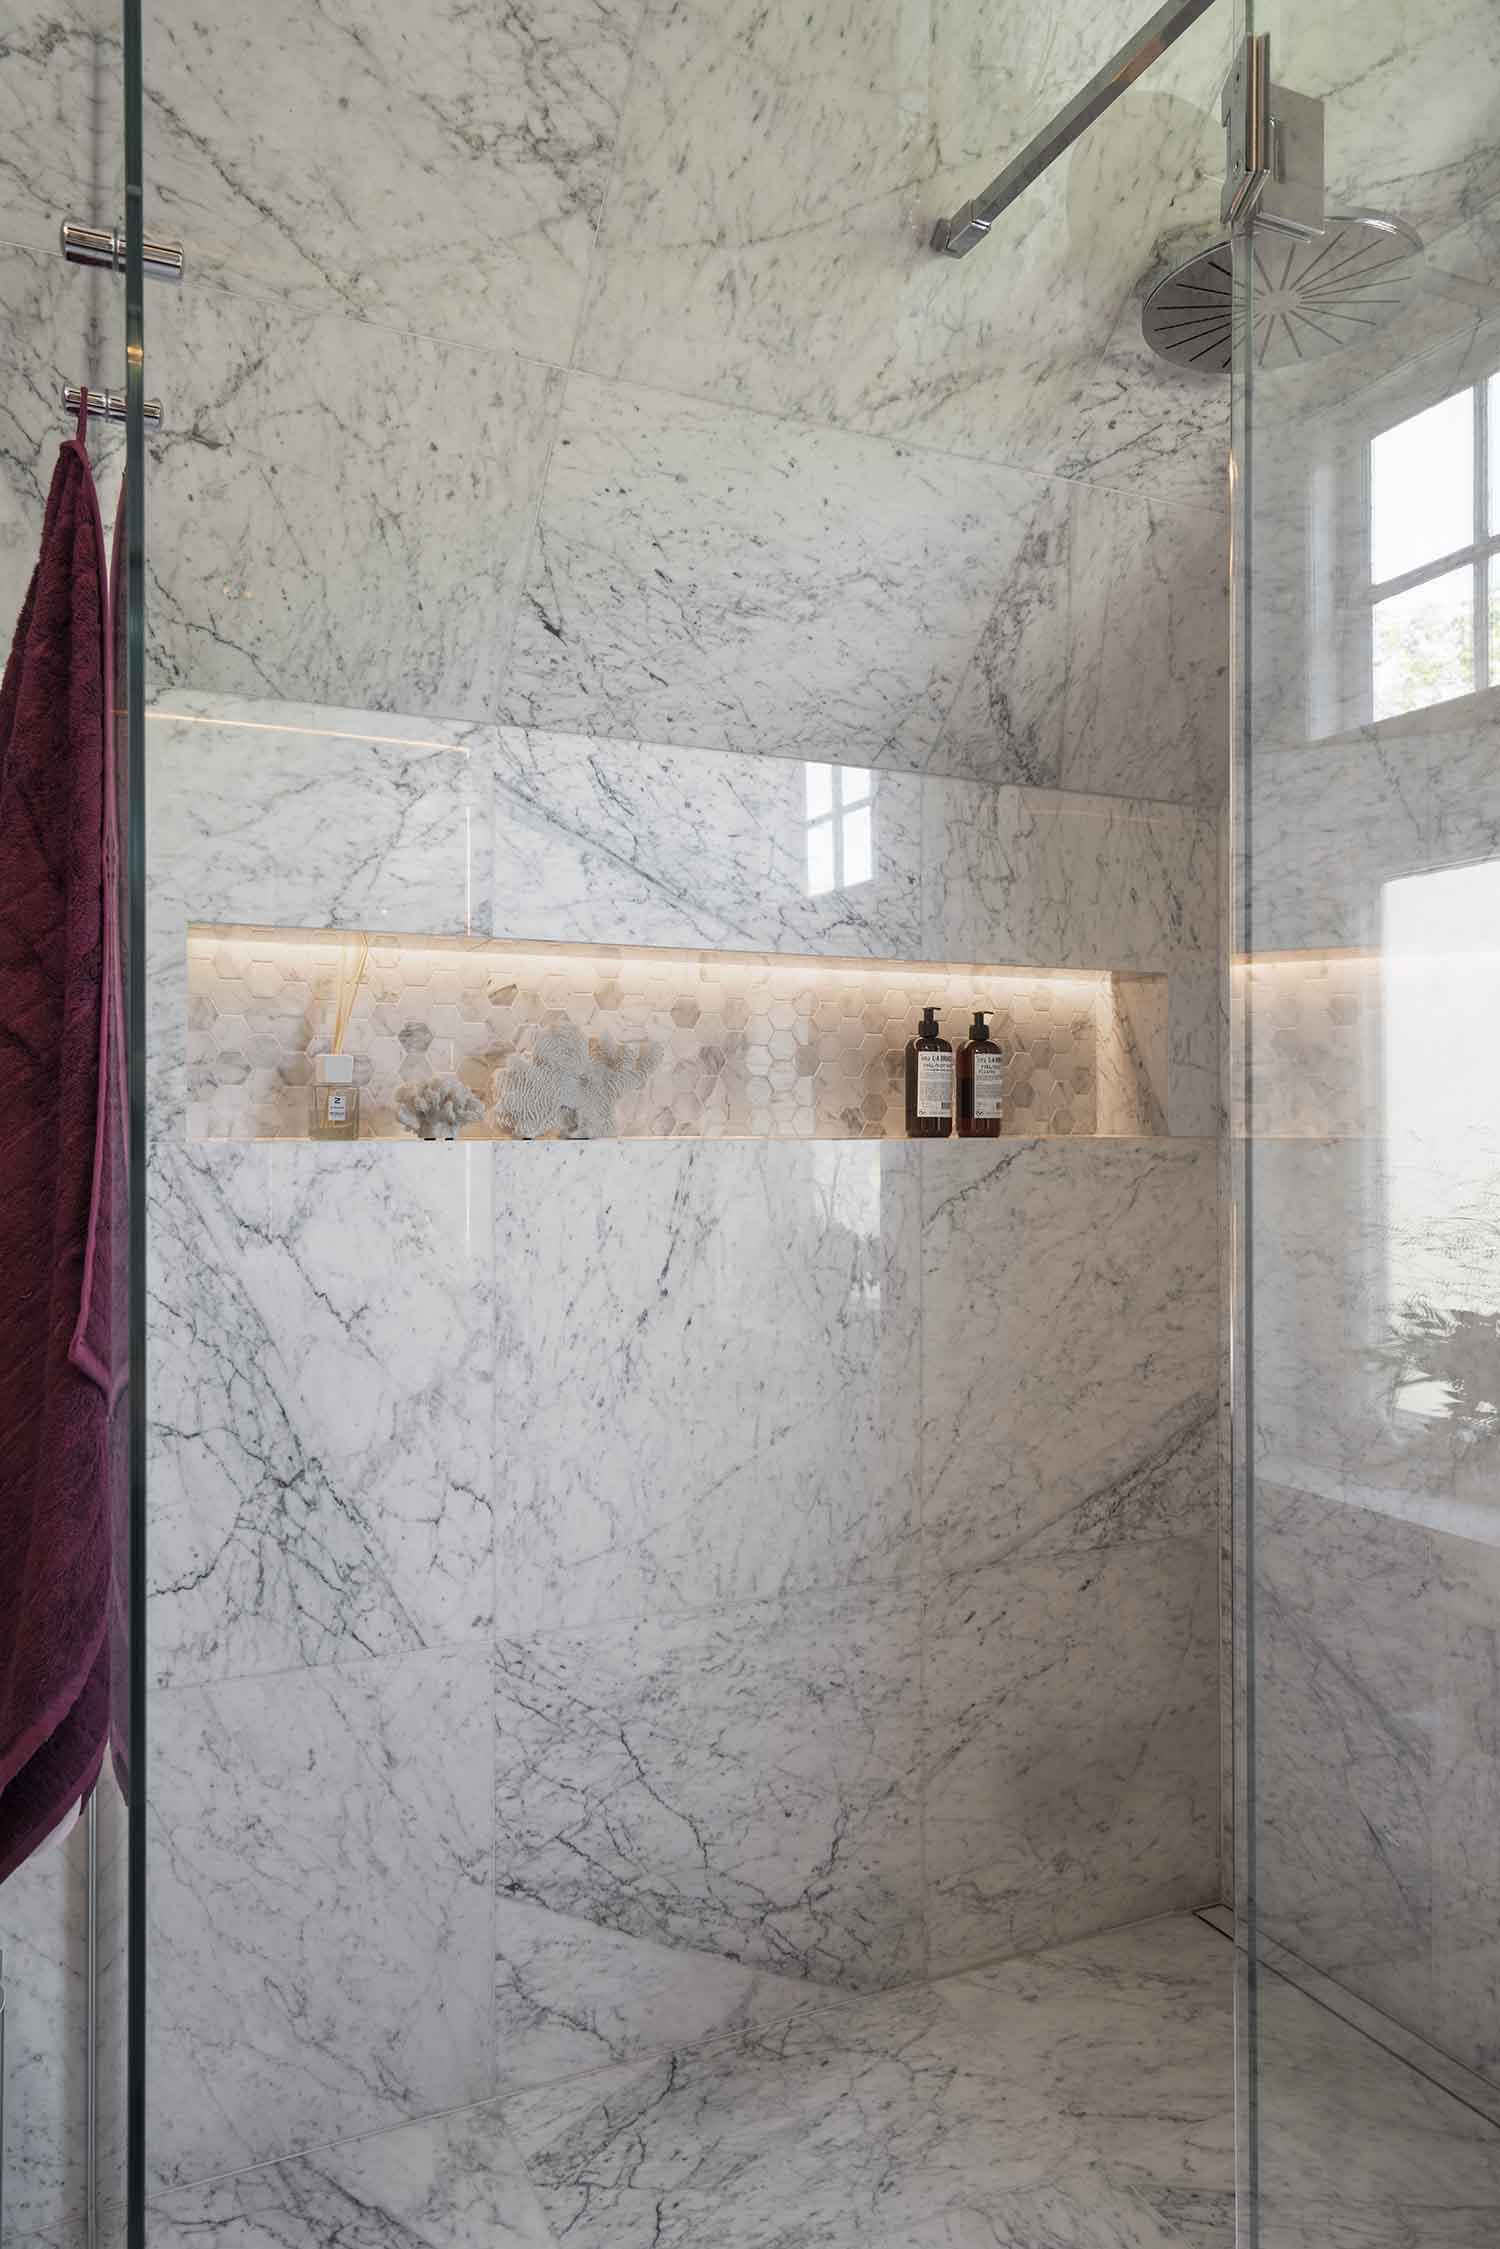 interiør, interiørarkitektur, ramsoskar, ramsøskar, bad, toalett, marmorbad, marmorfliser, marmordusj, dusj, luksusdusj